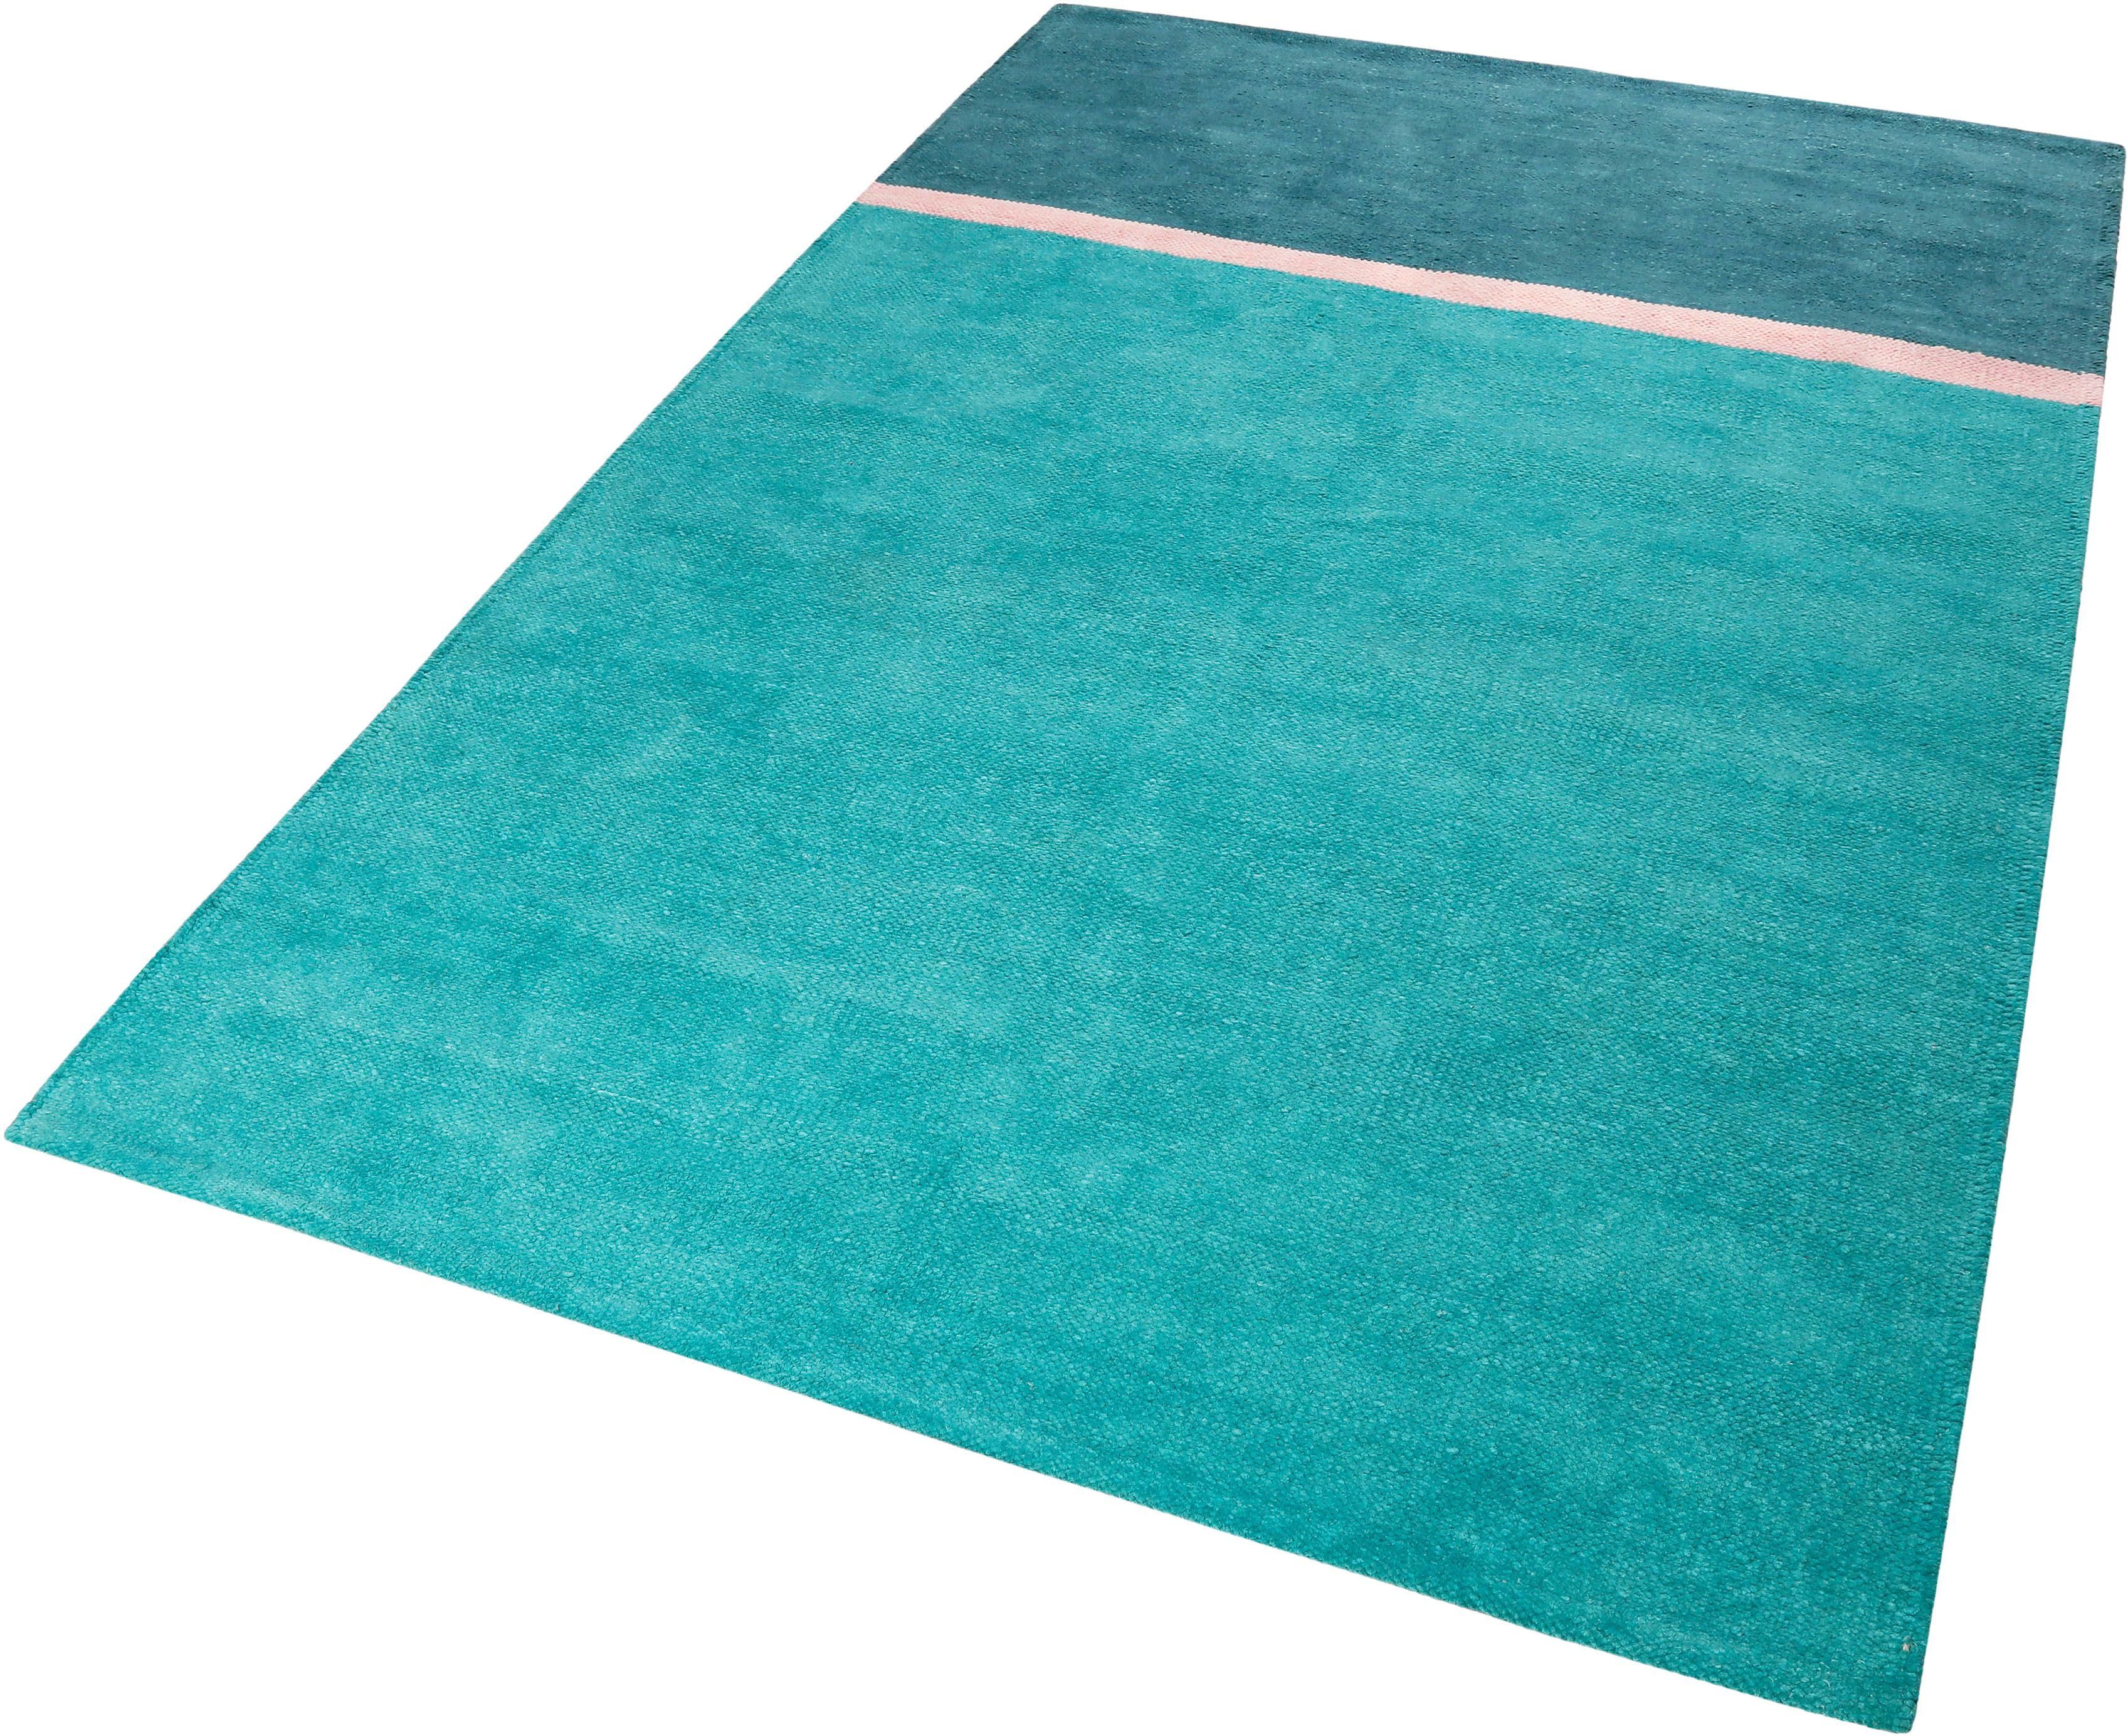 Teppich Calippo Kelim Esprit rechteckig Höhe 6 mm handgewebt